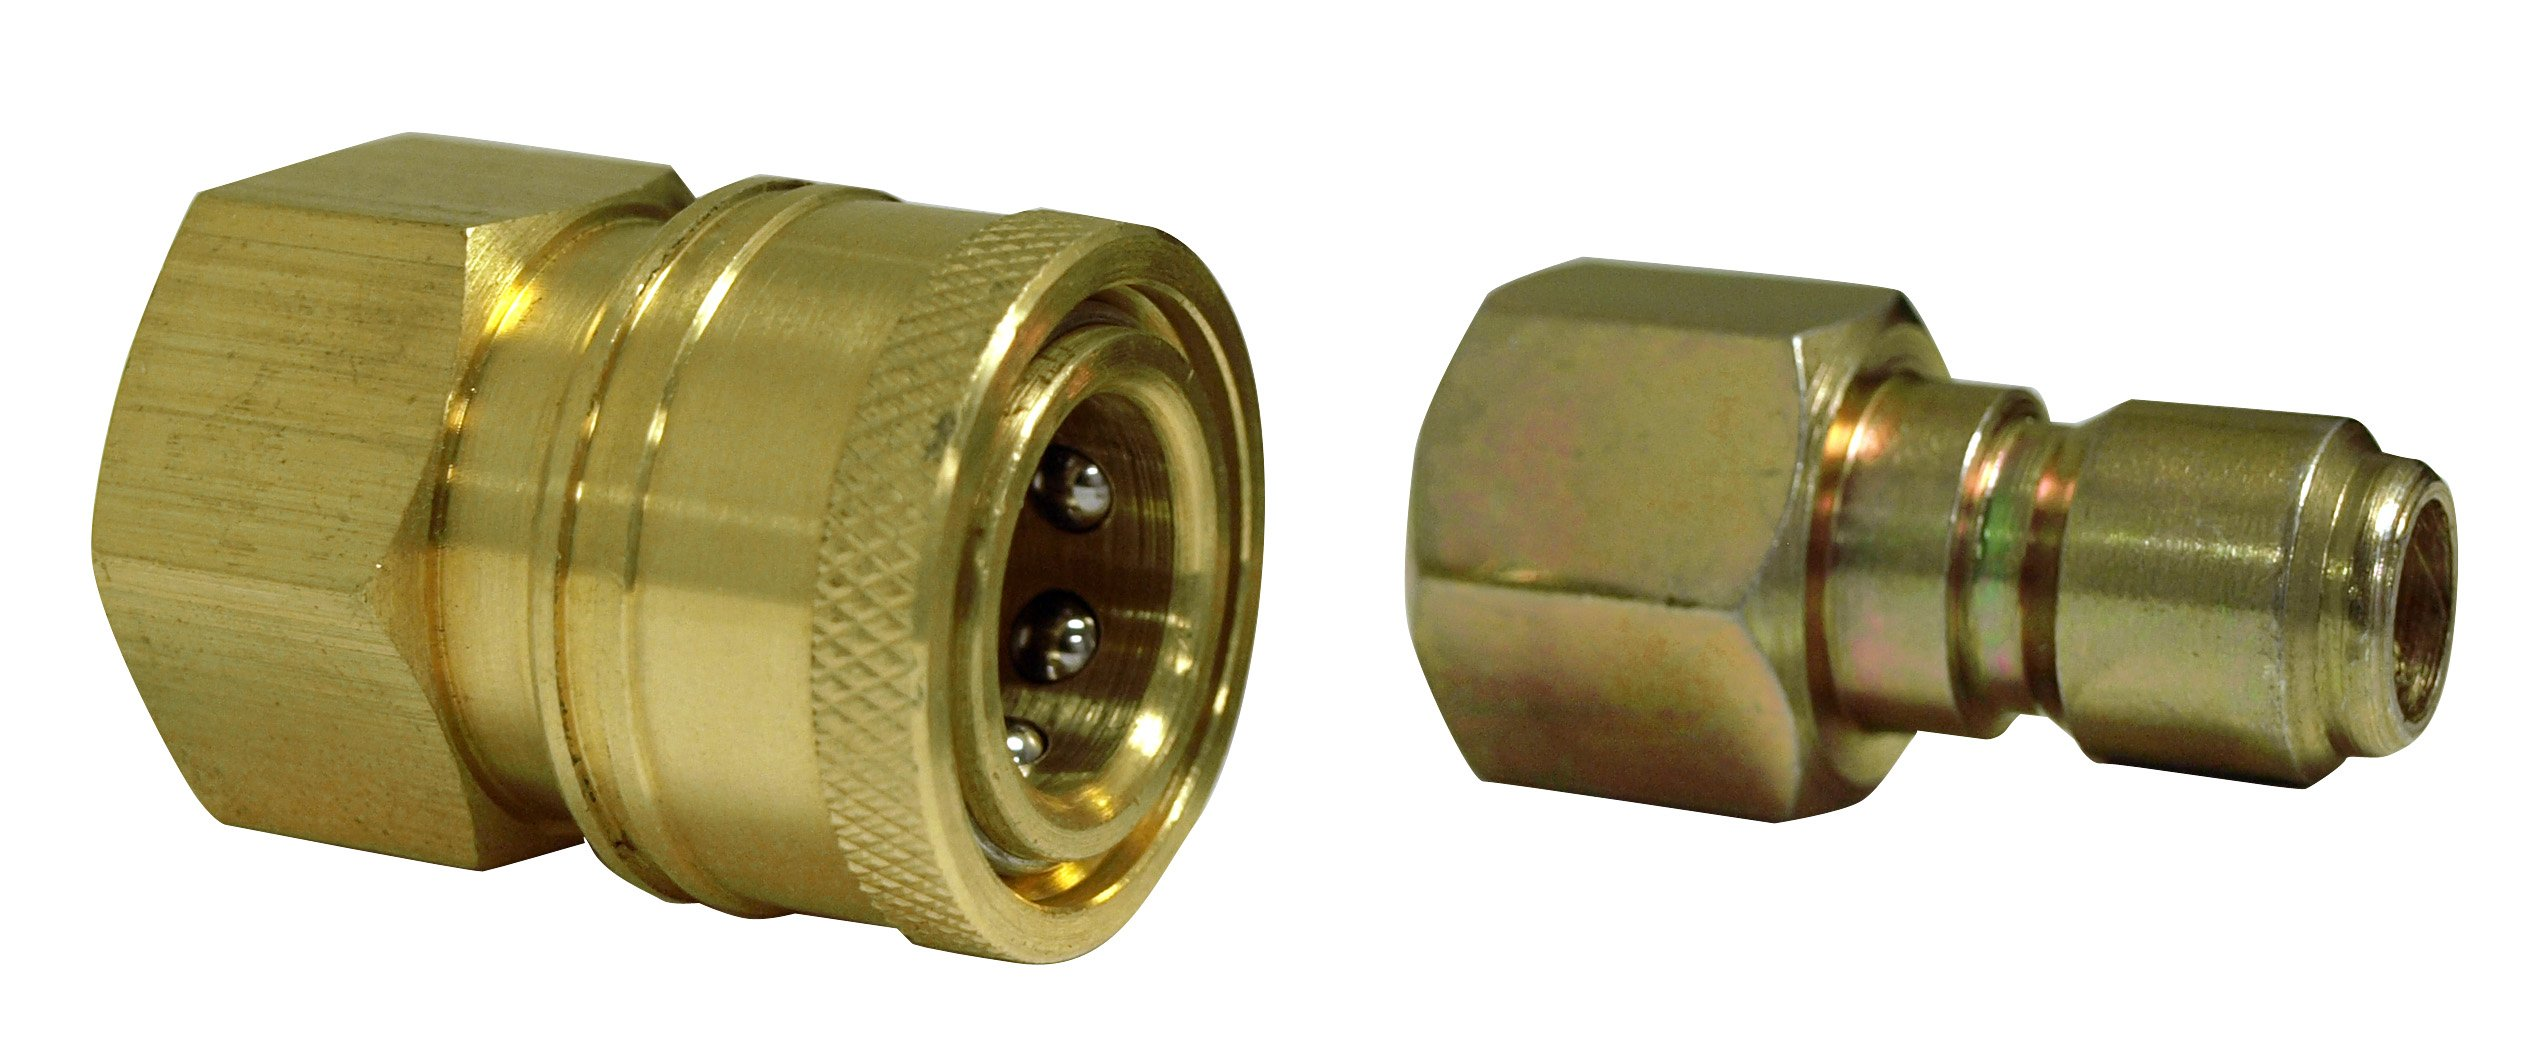 Pressure washer adapter set